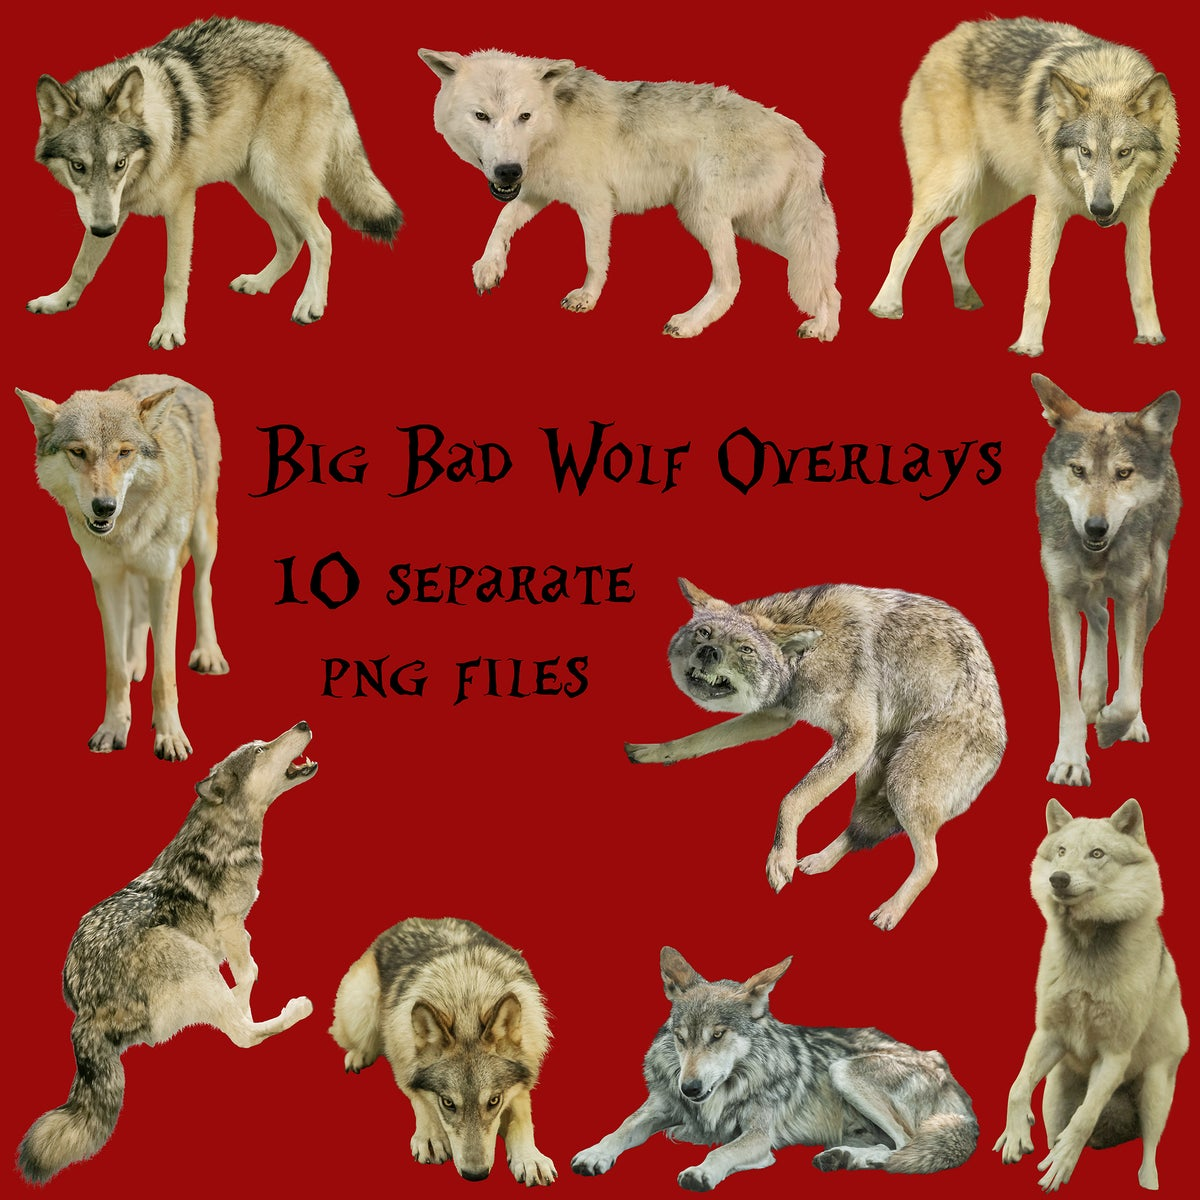 Image of Big Bad Wolf Overlays